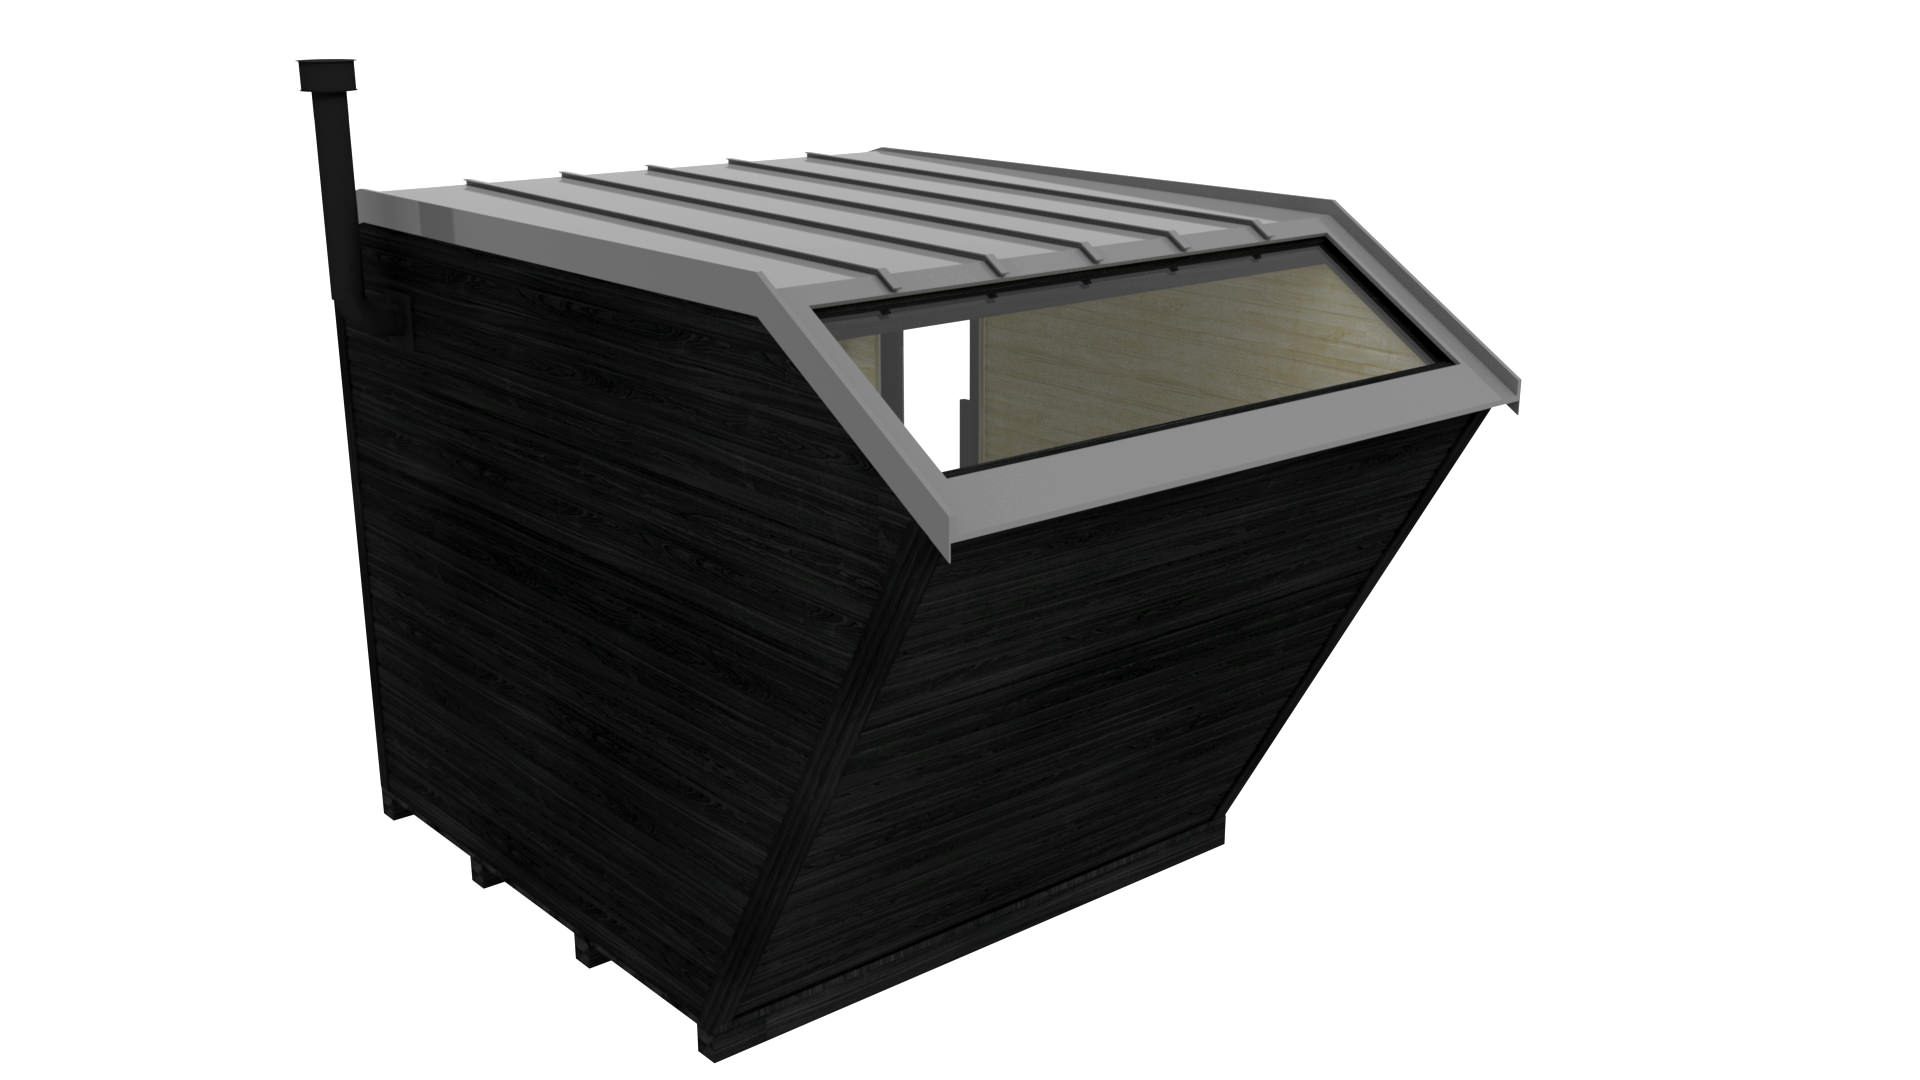 inua-jord-sauna-wooden-heater-4